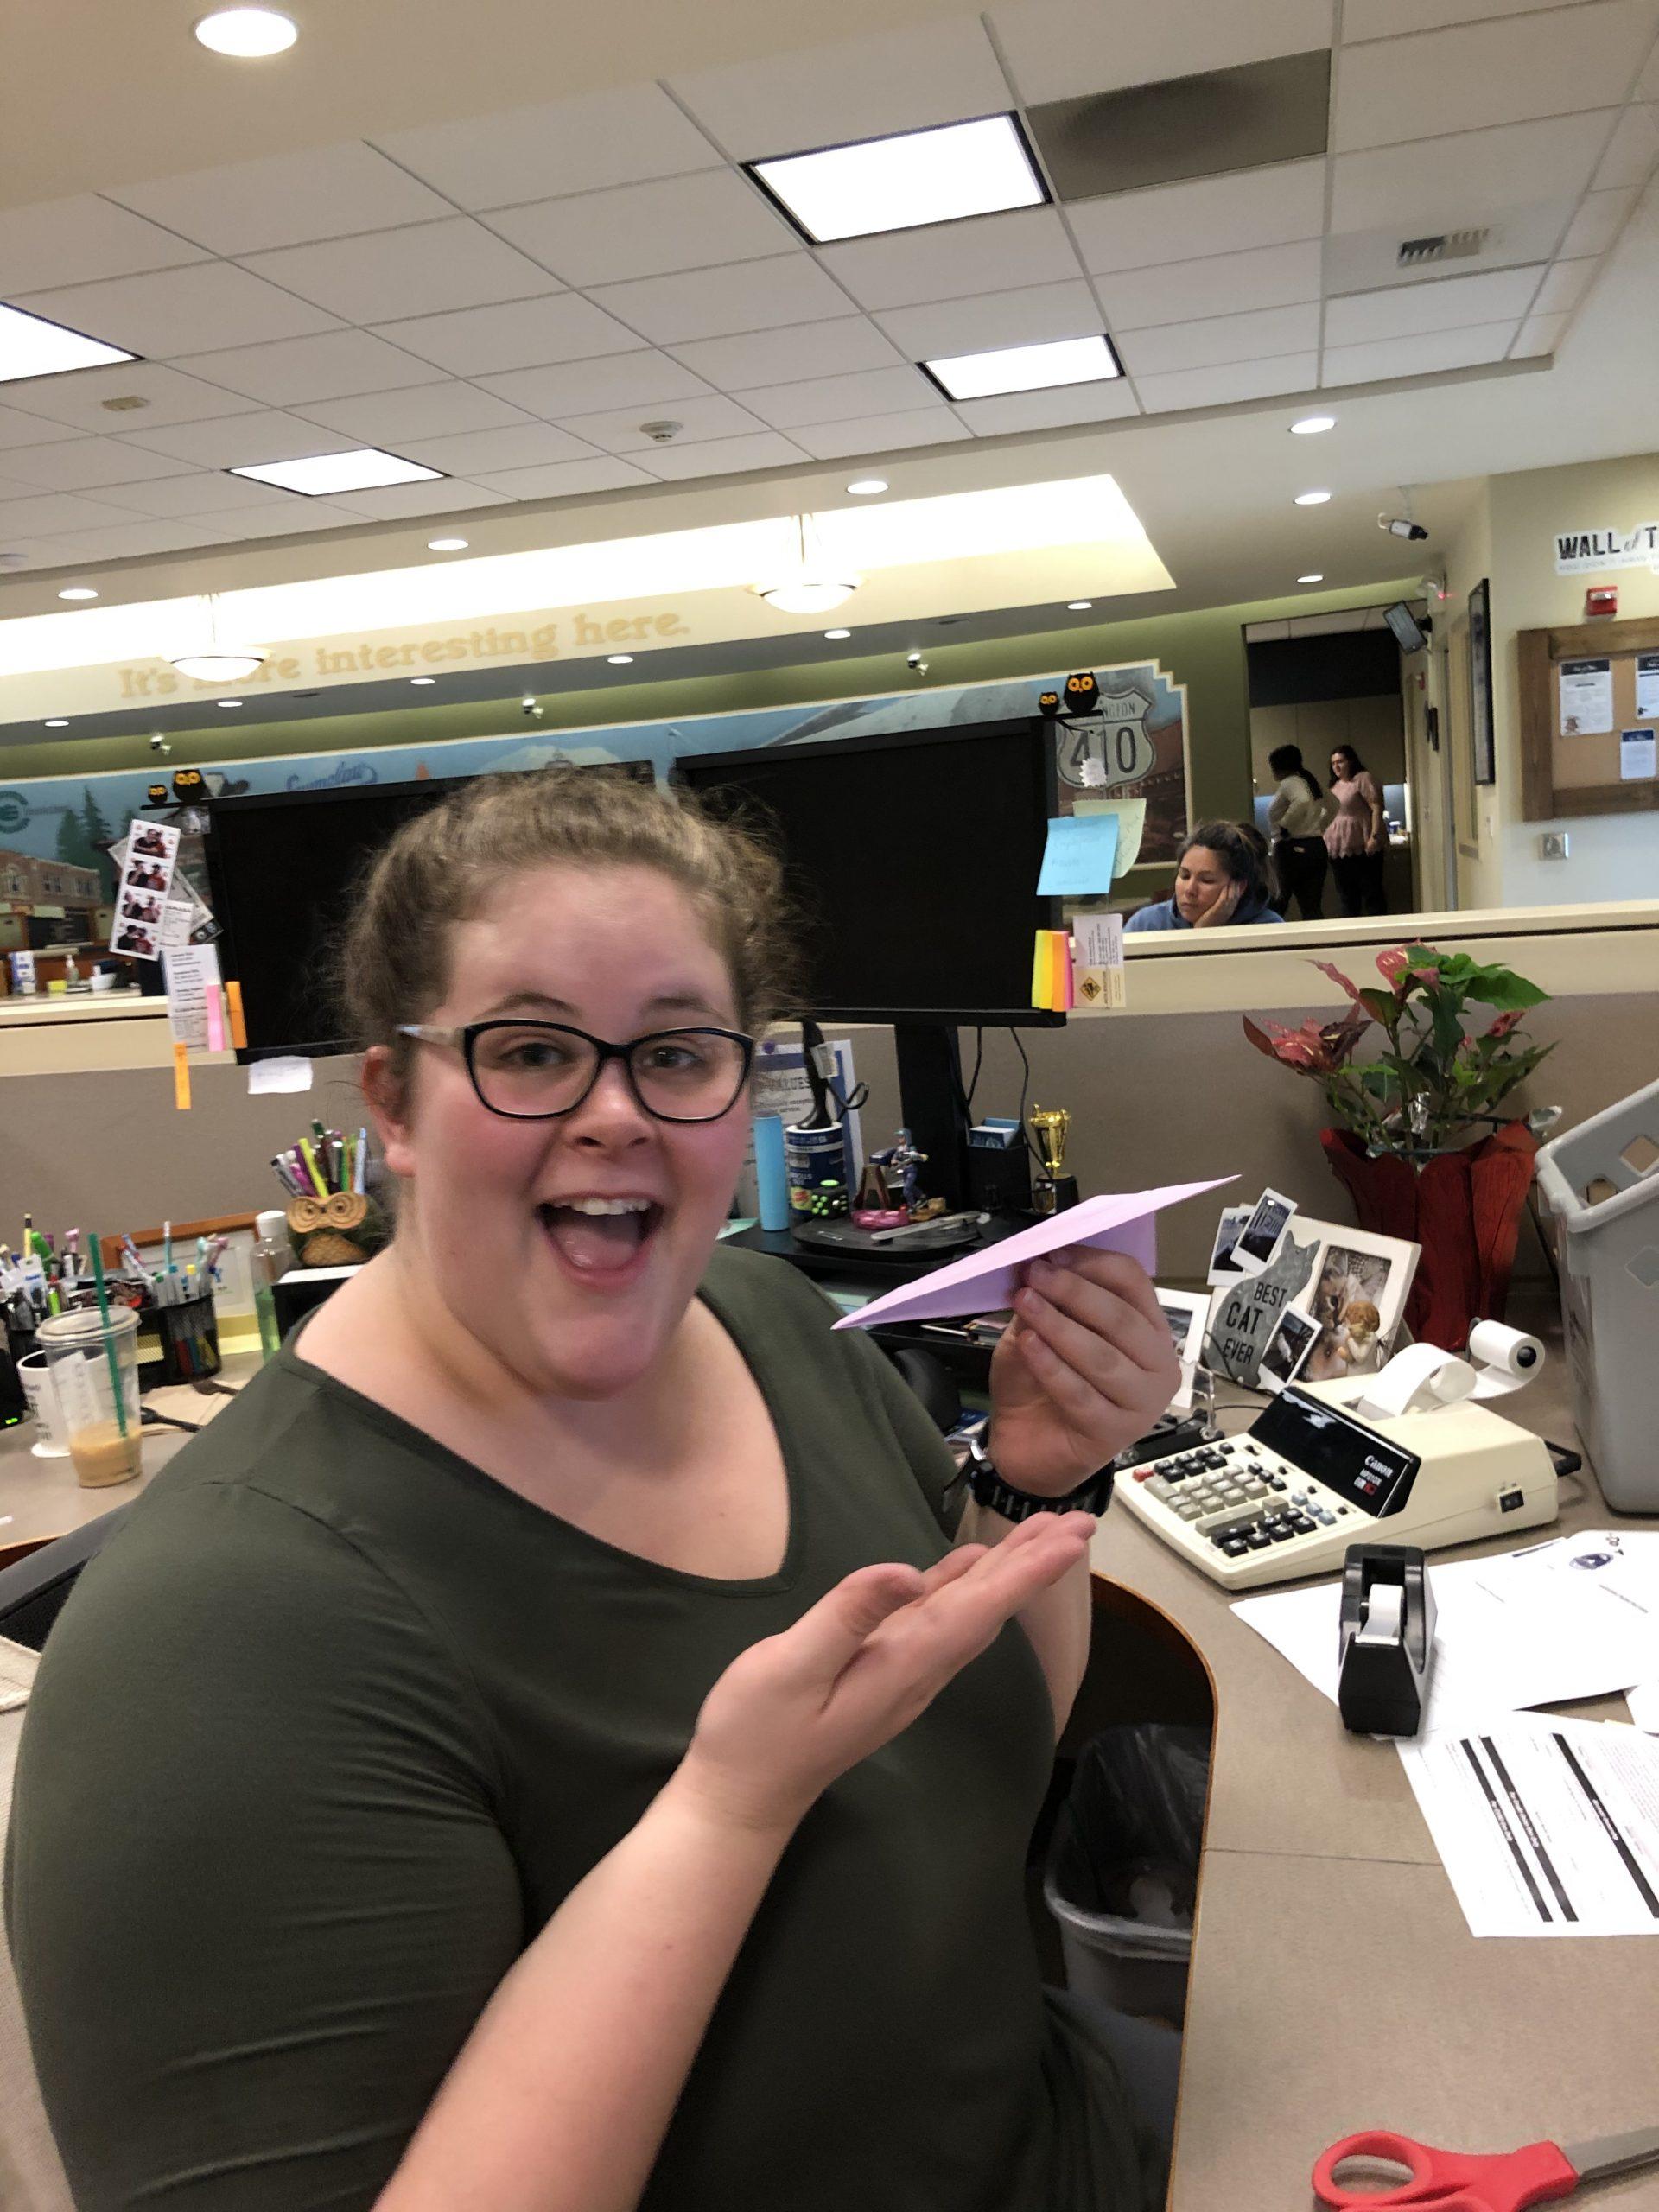 WRCU employee holding a paper airplane